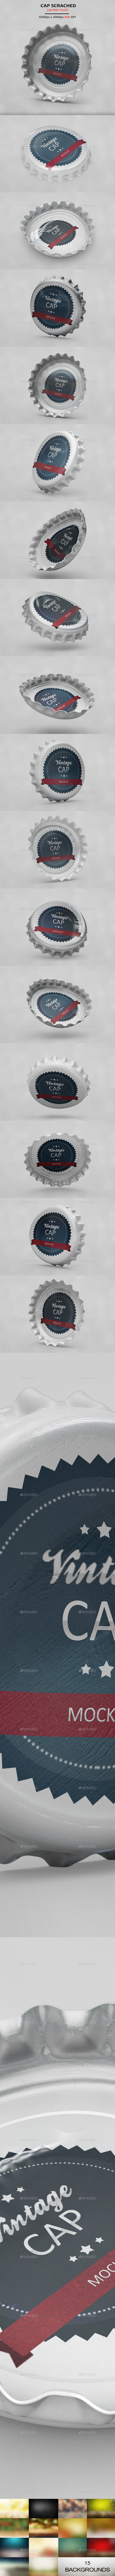 Bottle Cap Scratched Mockup - Product Mock-Ups Graphics